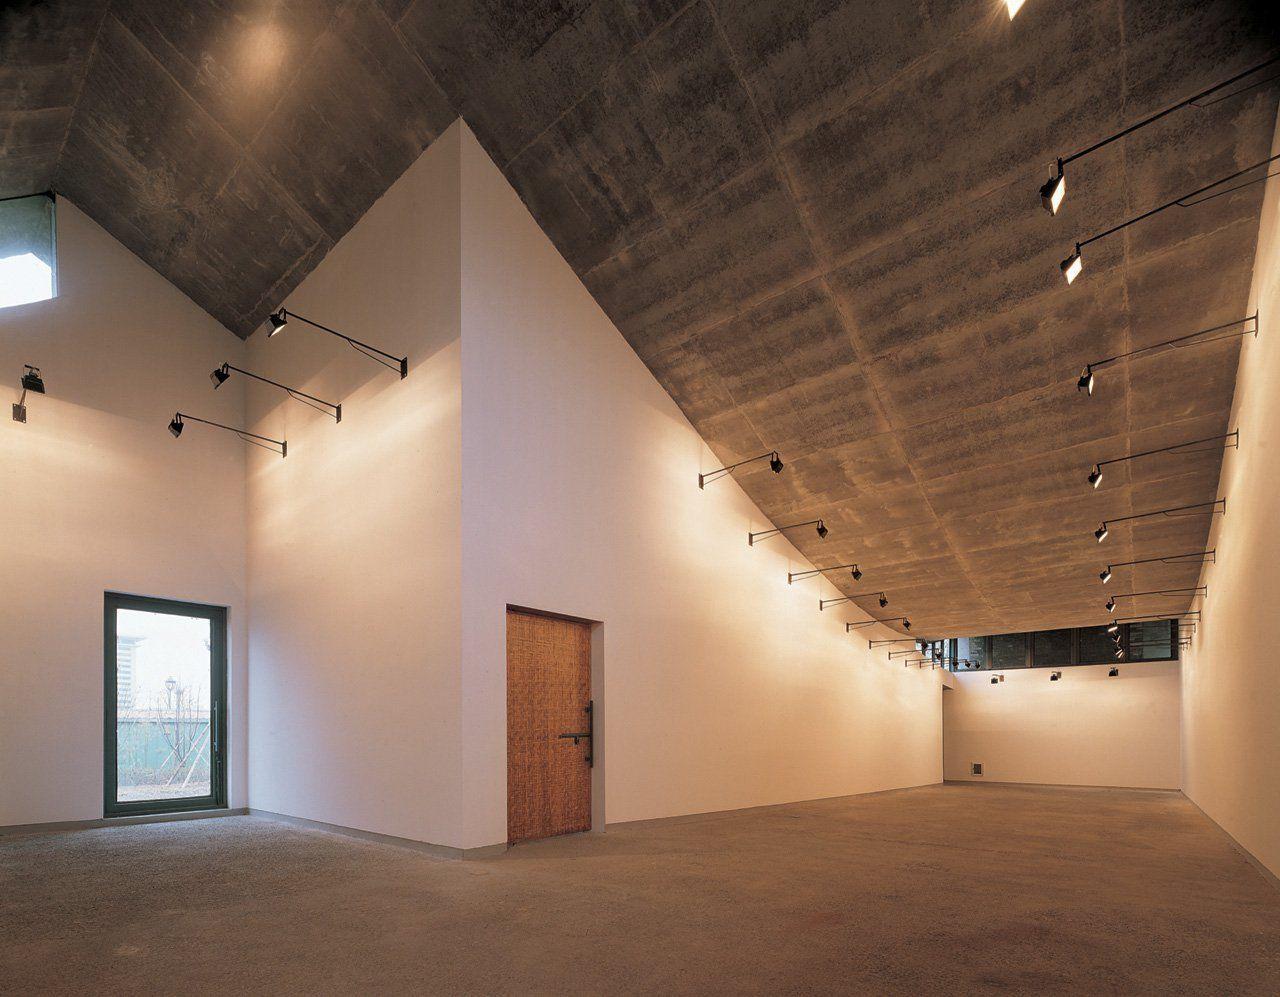 Galería de La obra de Wang Shu, Premio Pritzker 2012 - 35